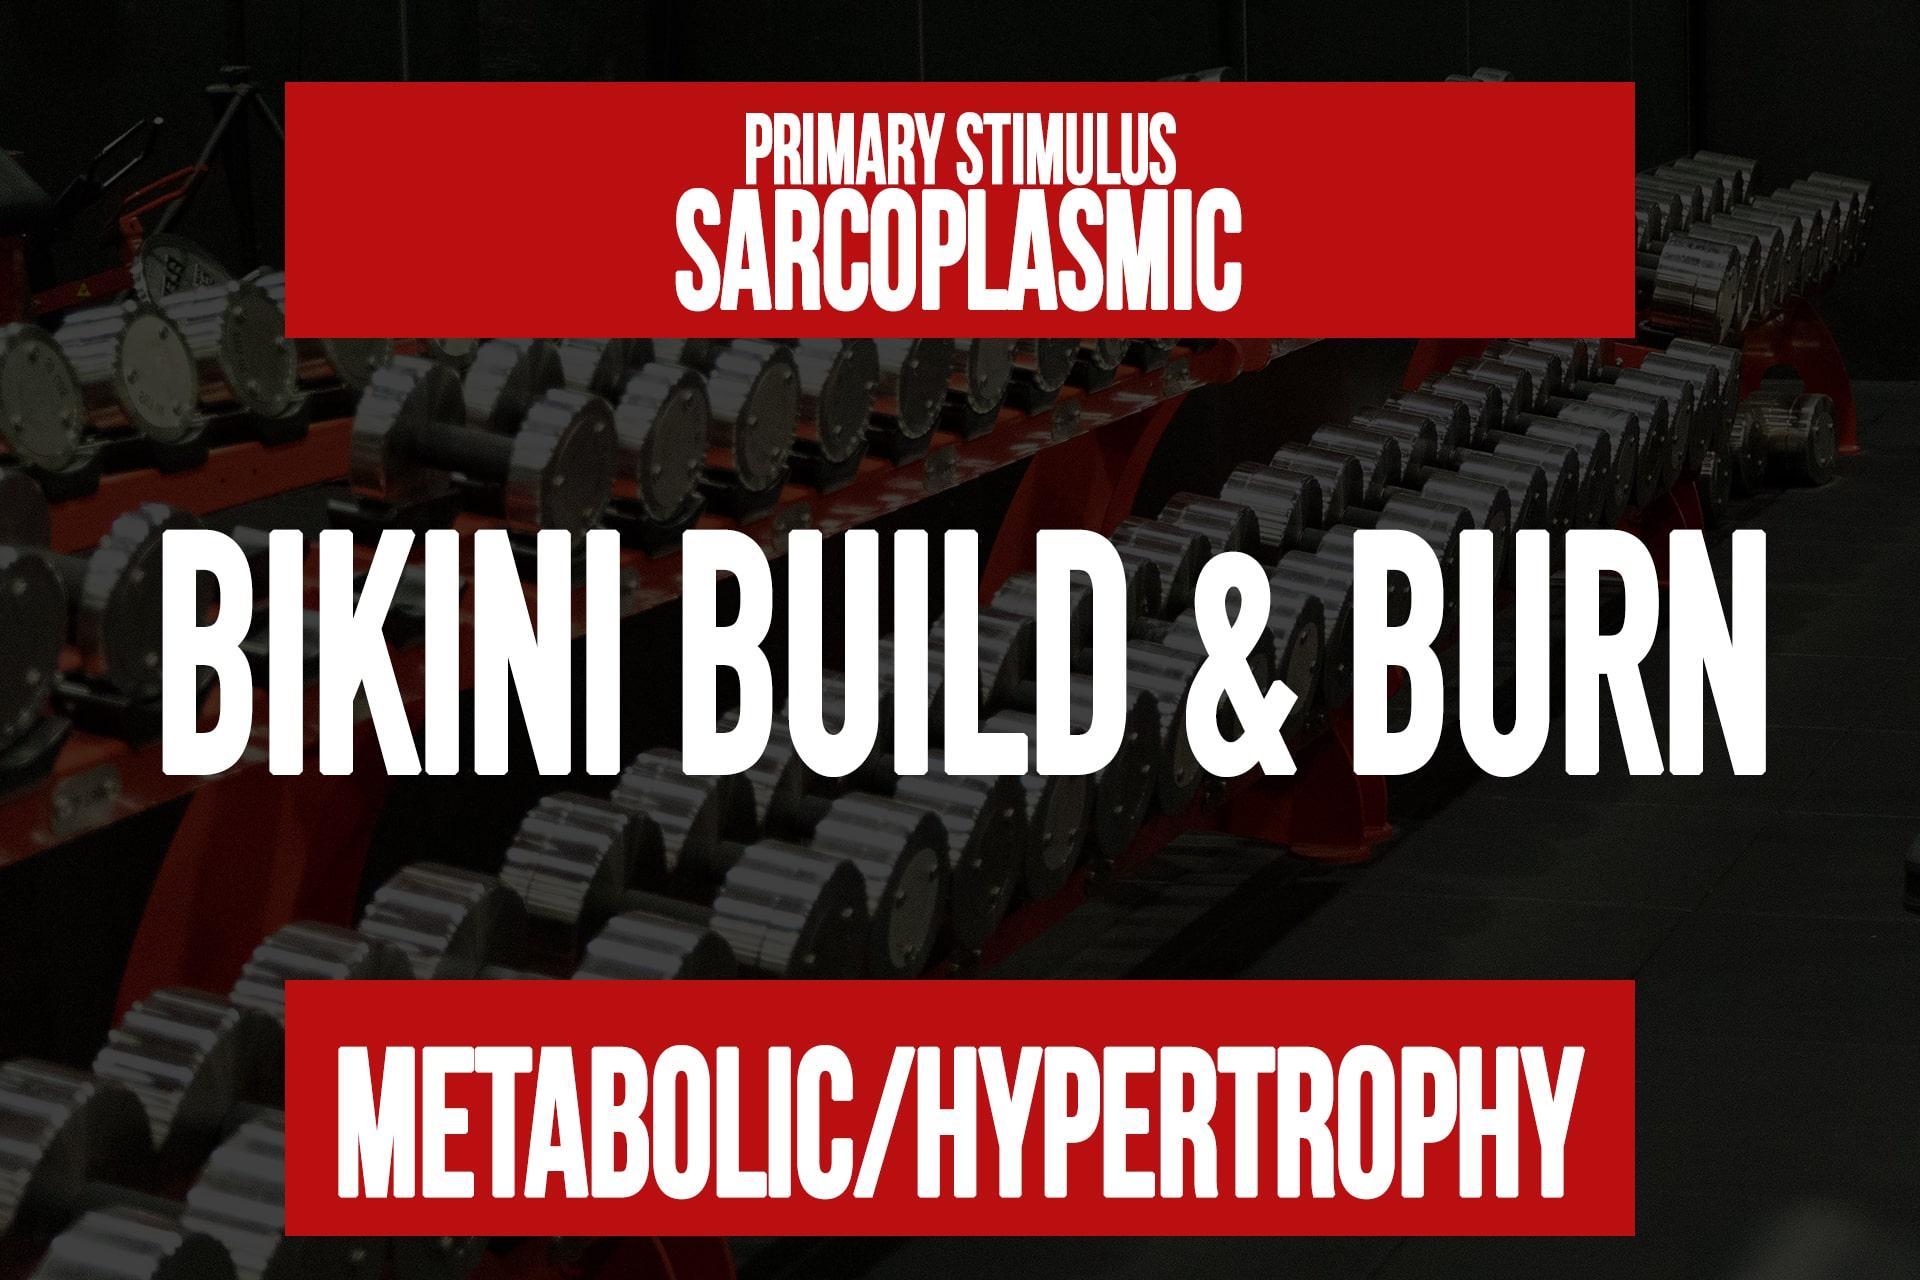 Bikini Build & Burn